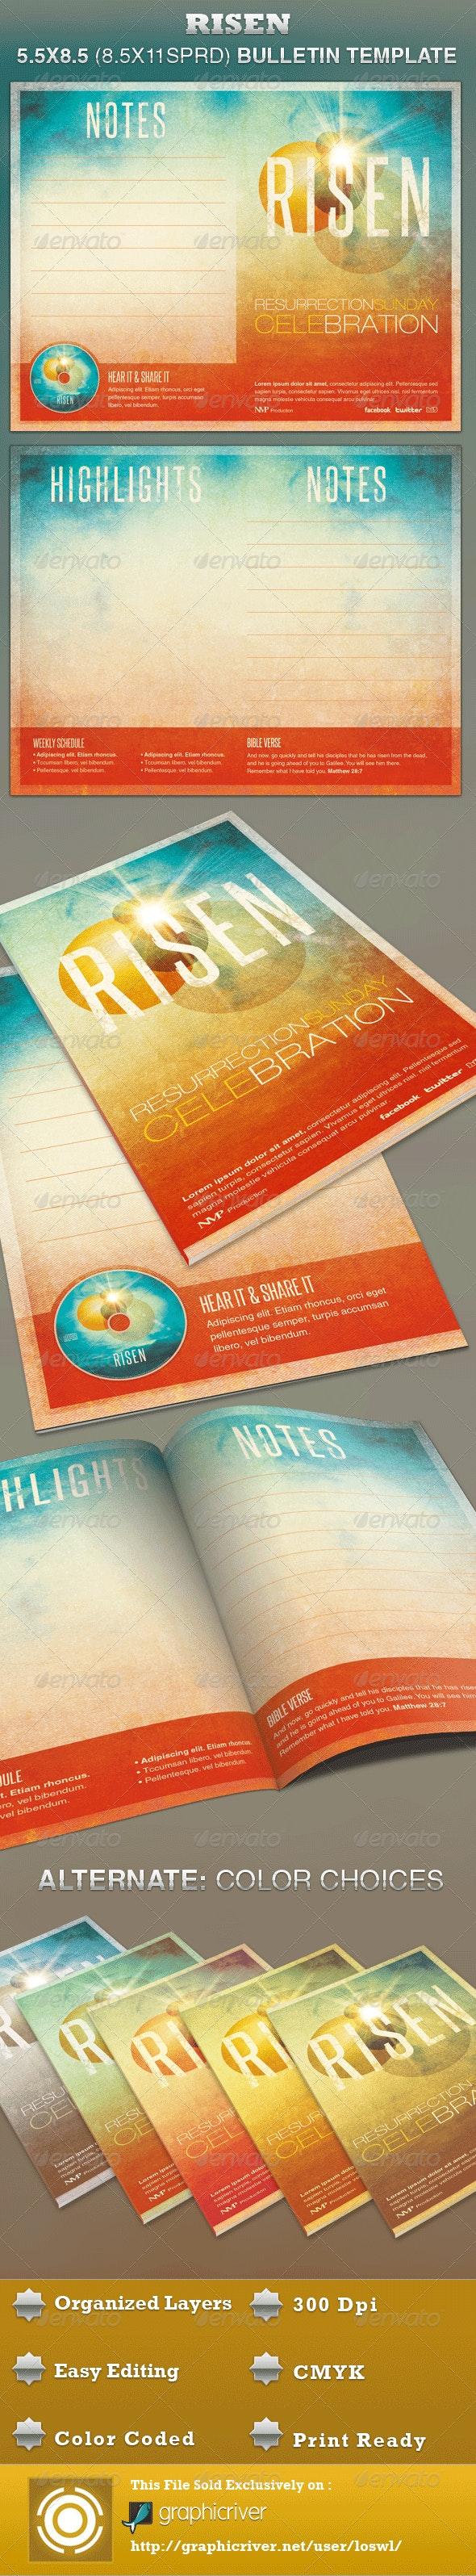 Risen Church Bulletin Template - Informational Brochures